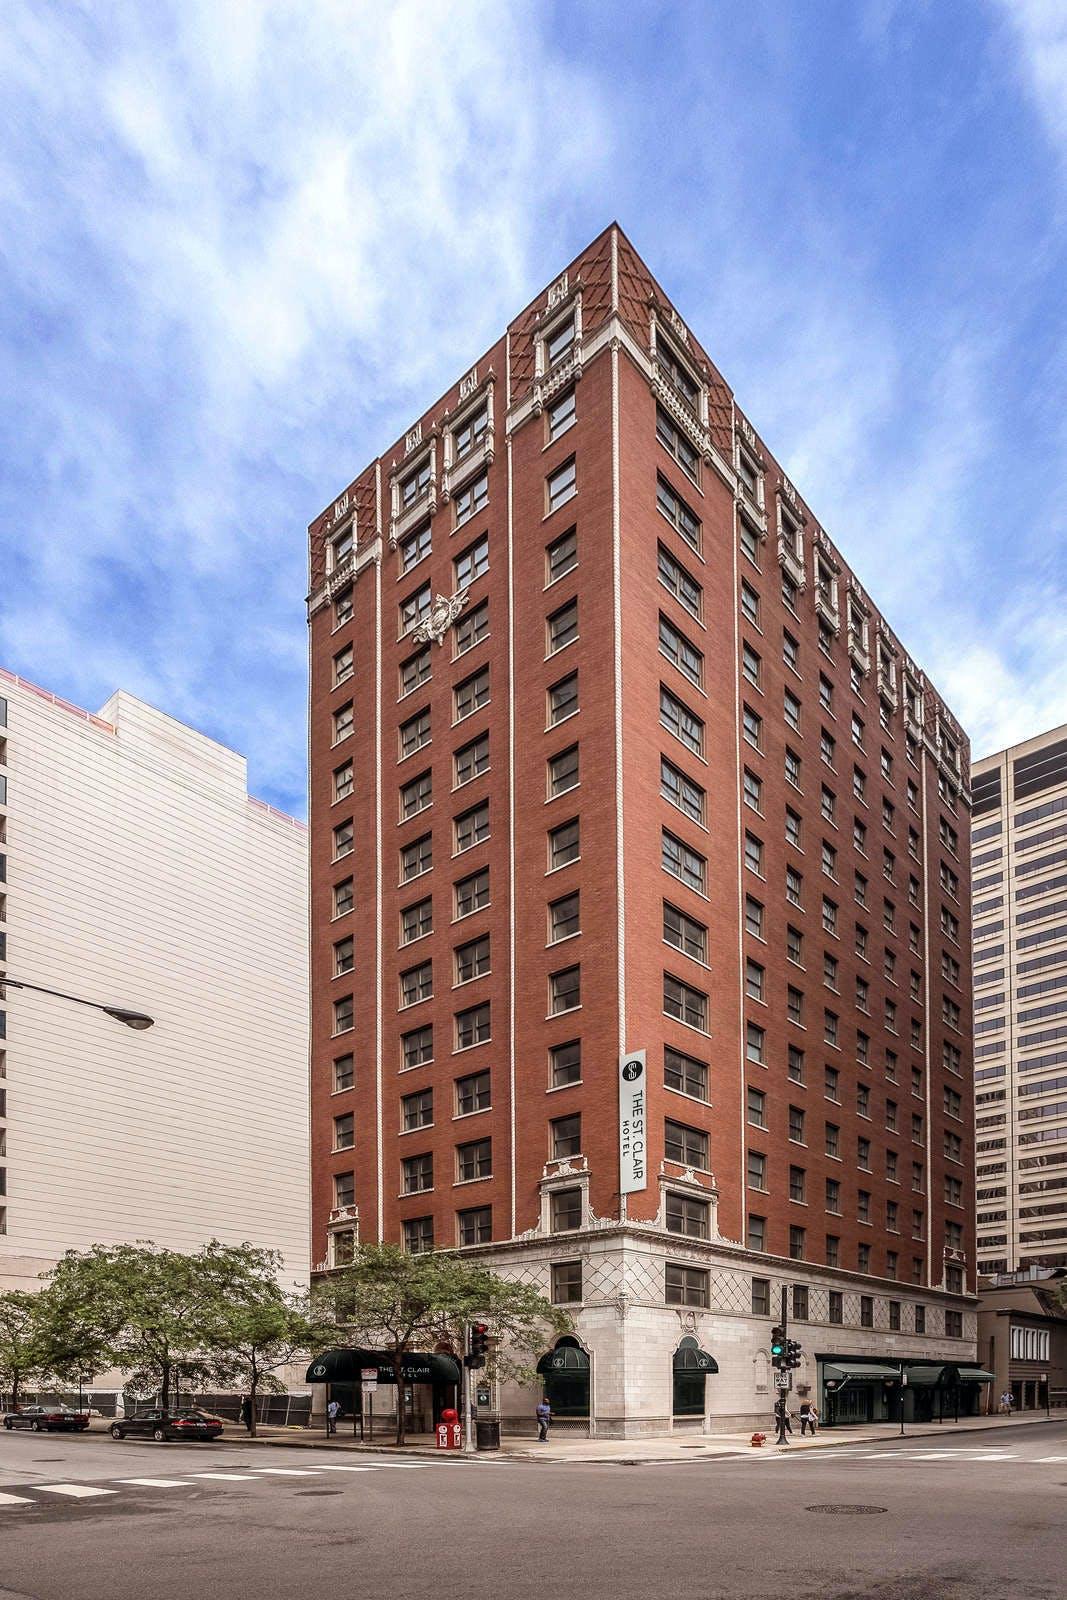 St. Clair Hotel - Magnificent Mile